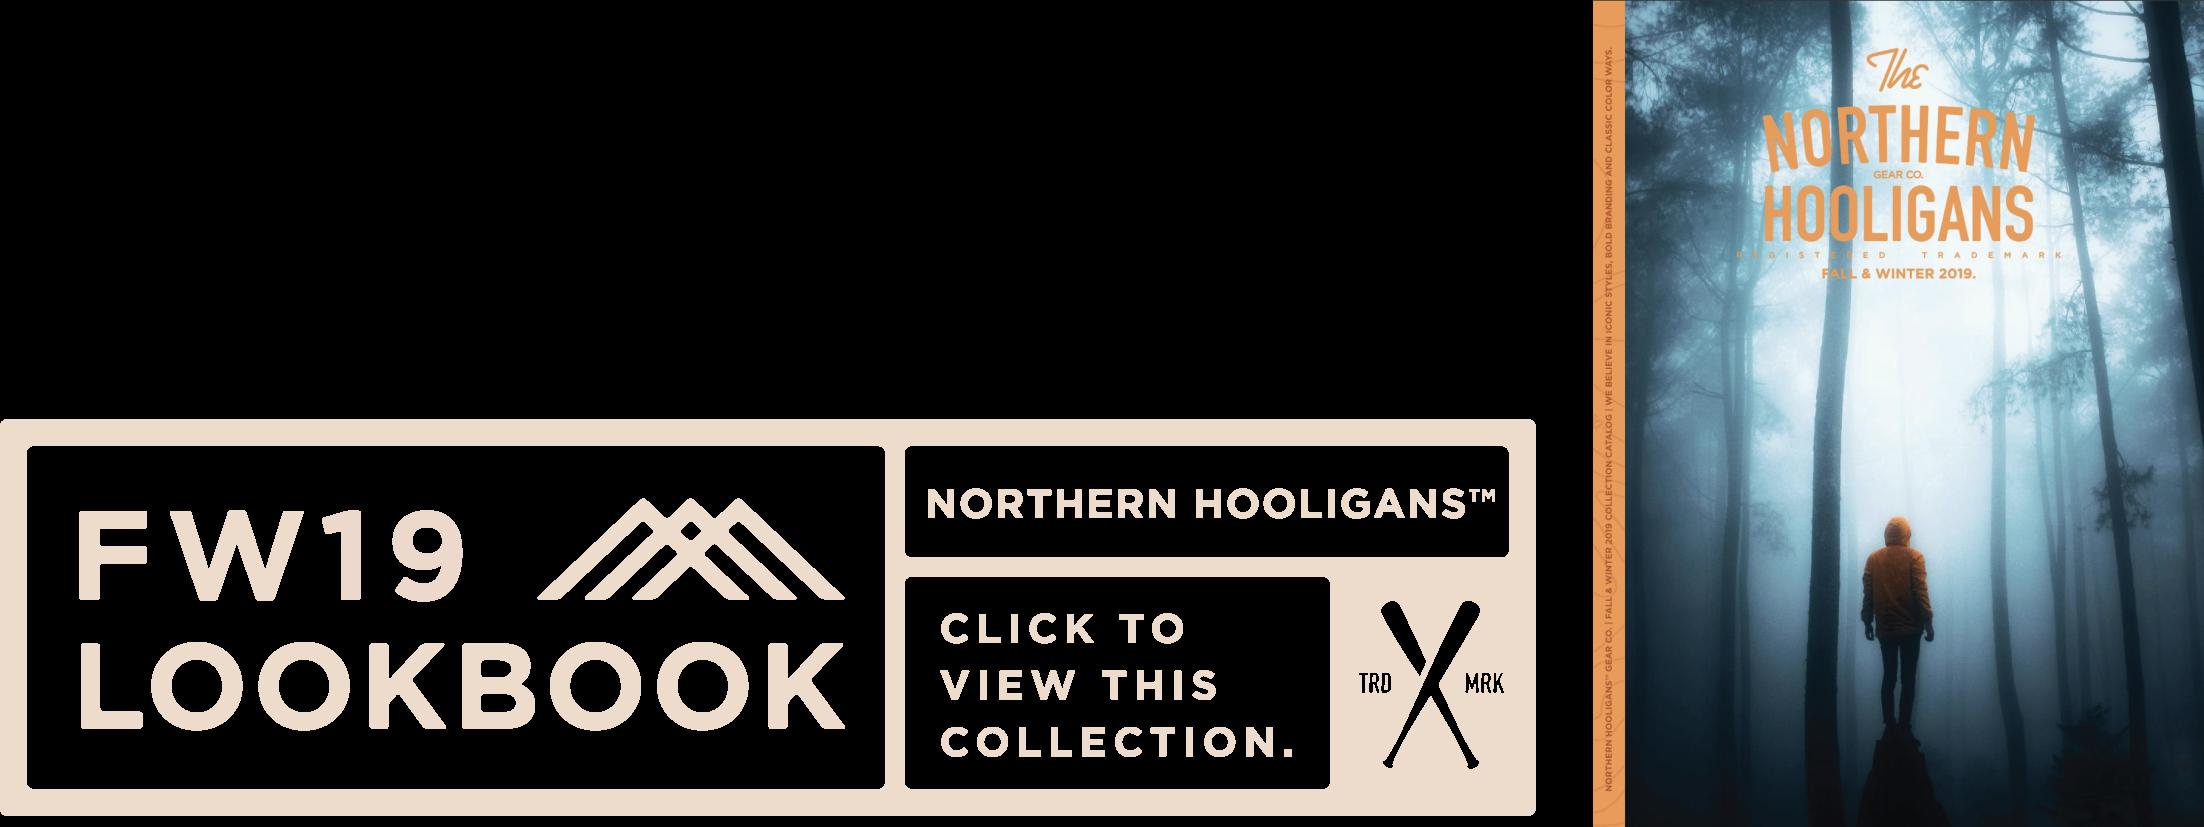 LOOKBOOKS_FW19.png